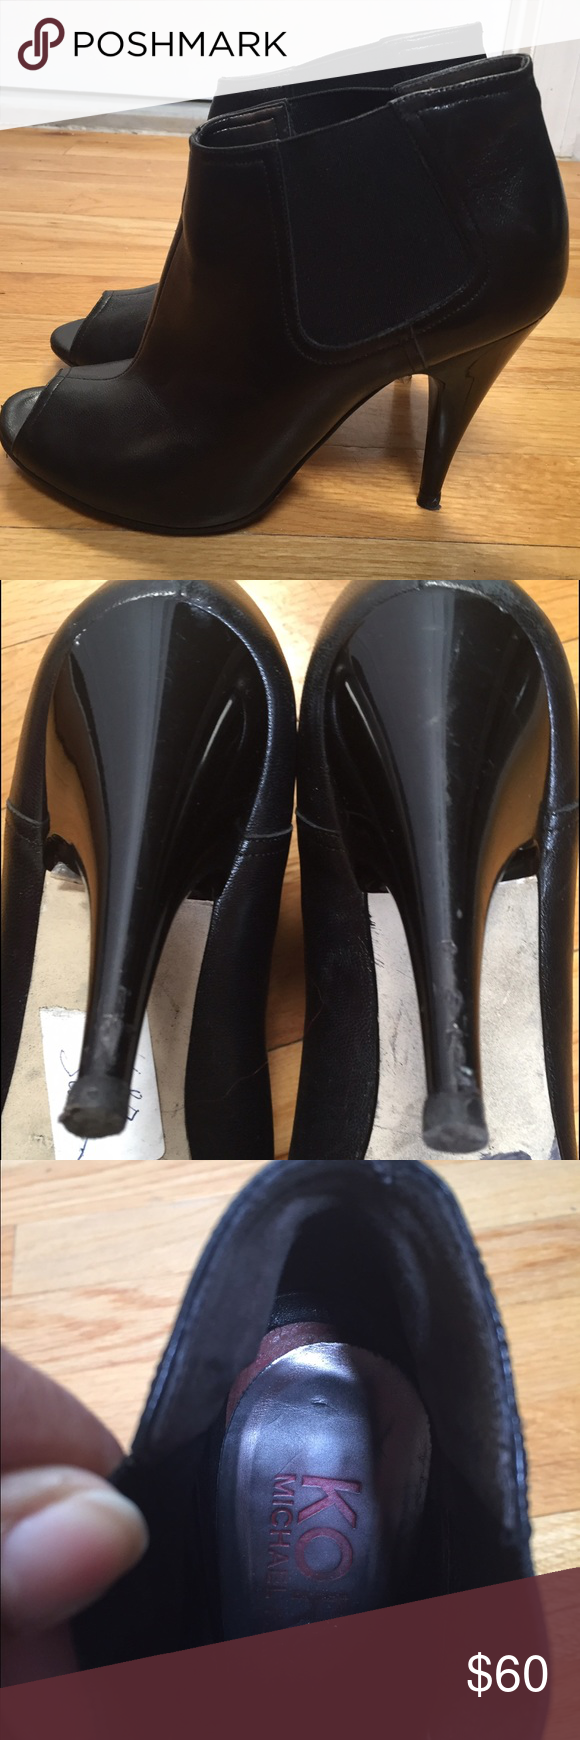 Michael Kors Peep Toe Booties Black leather designer peep toe heels. Recently re-soles. A few scuff marks on heels. Slight wear on inside heel cushion area. MICHAEL Michael Kors Shoes Ankle Boots & Booties